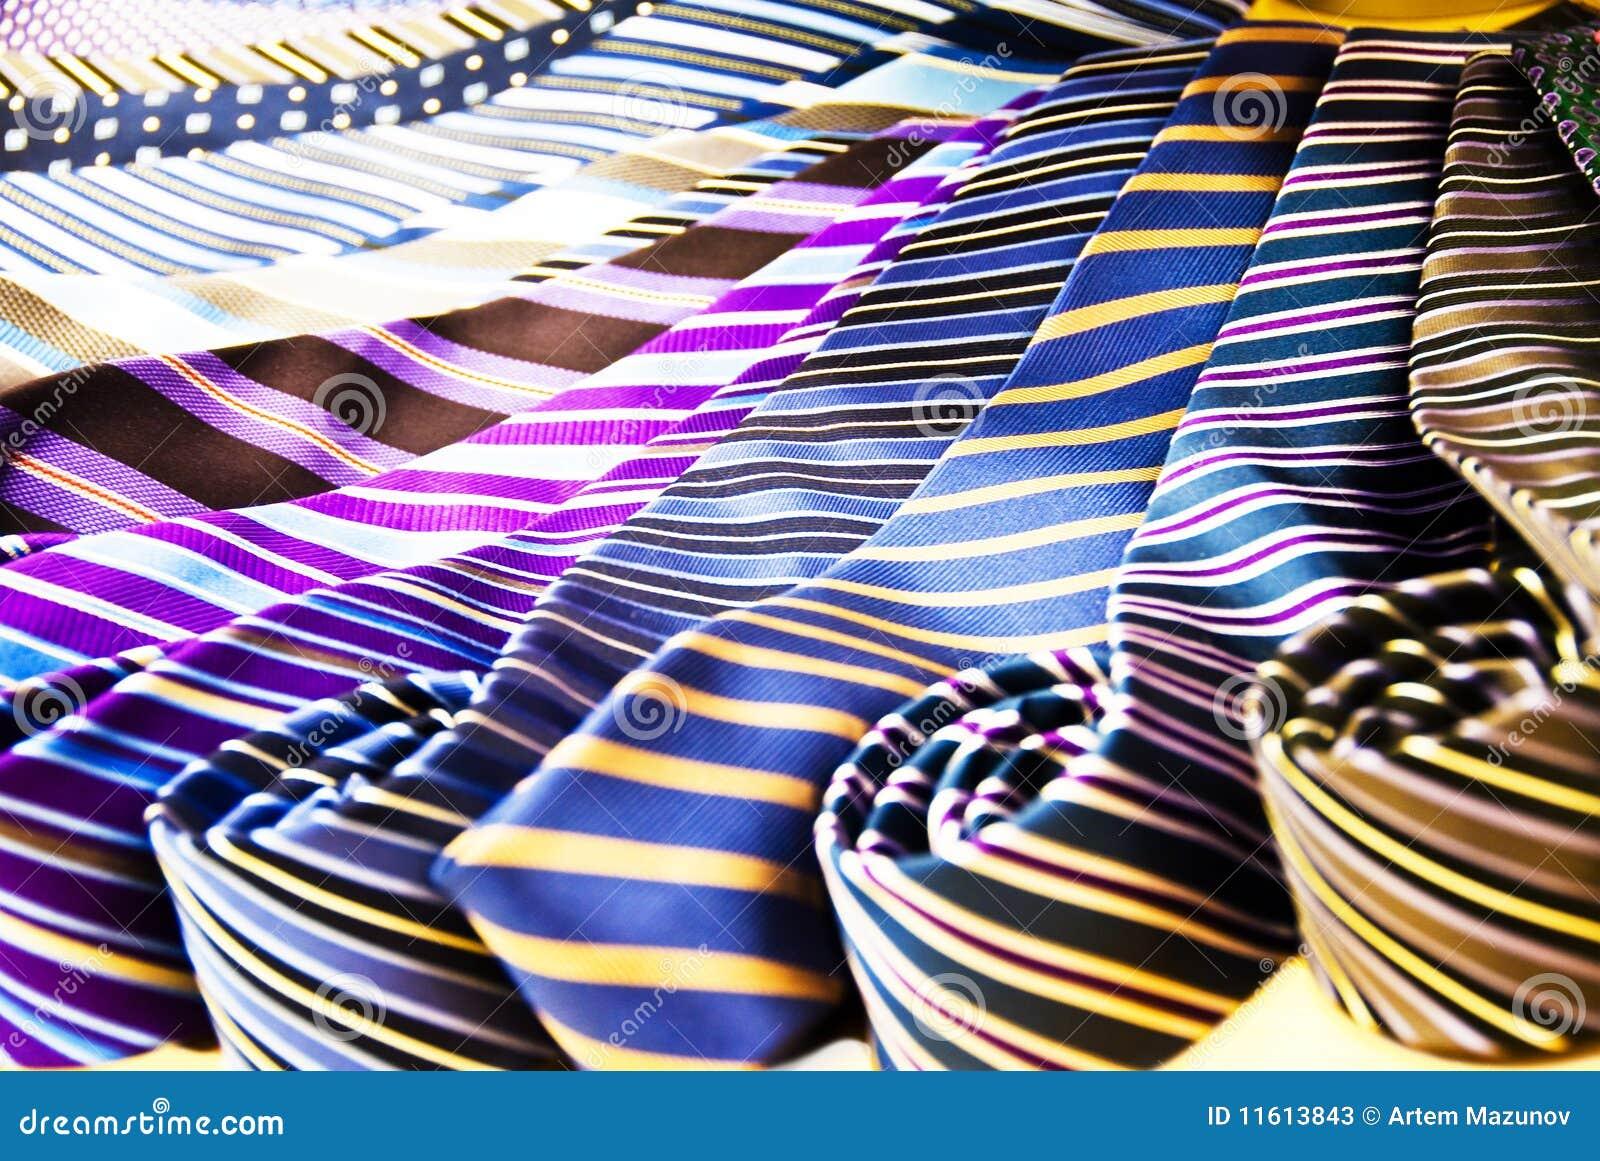 Mycket ties